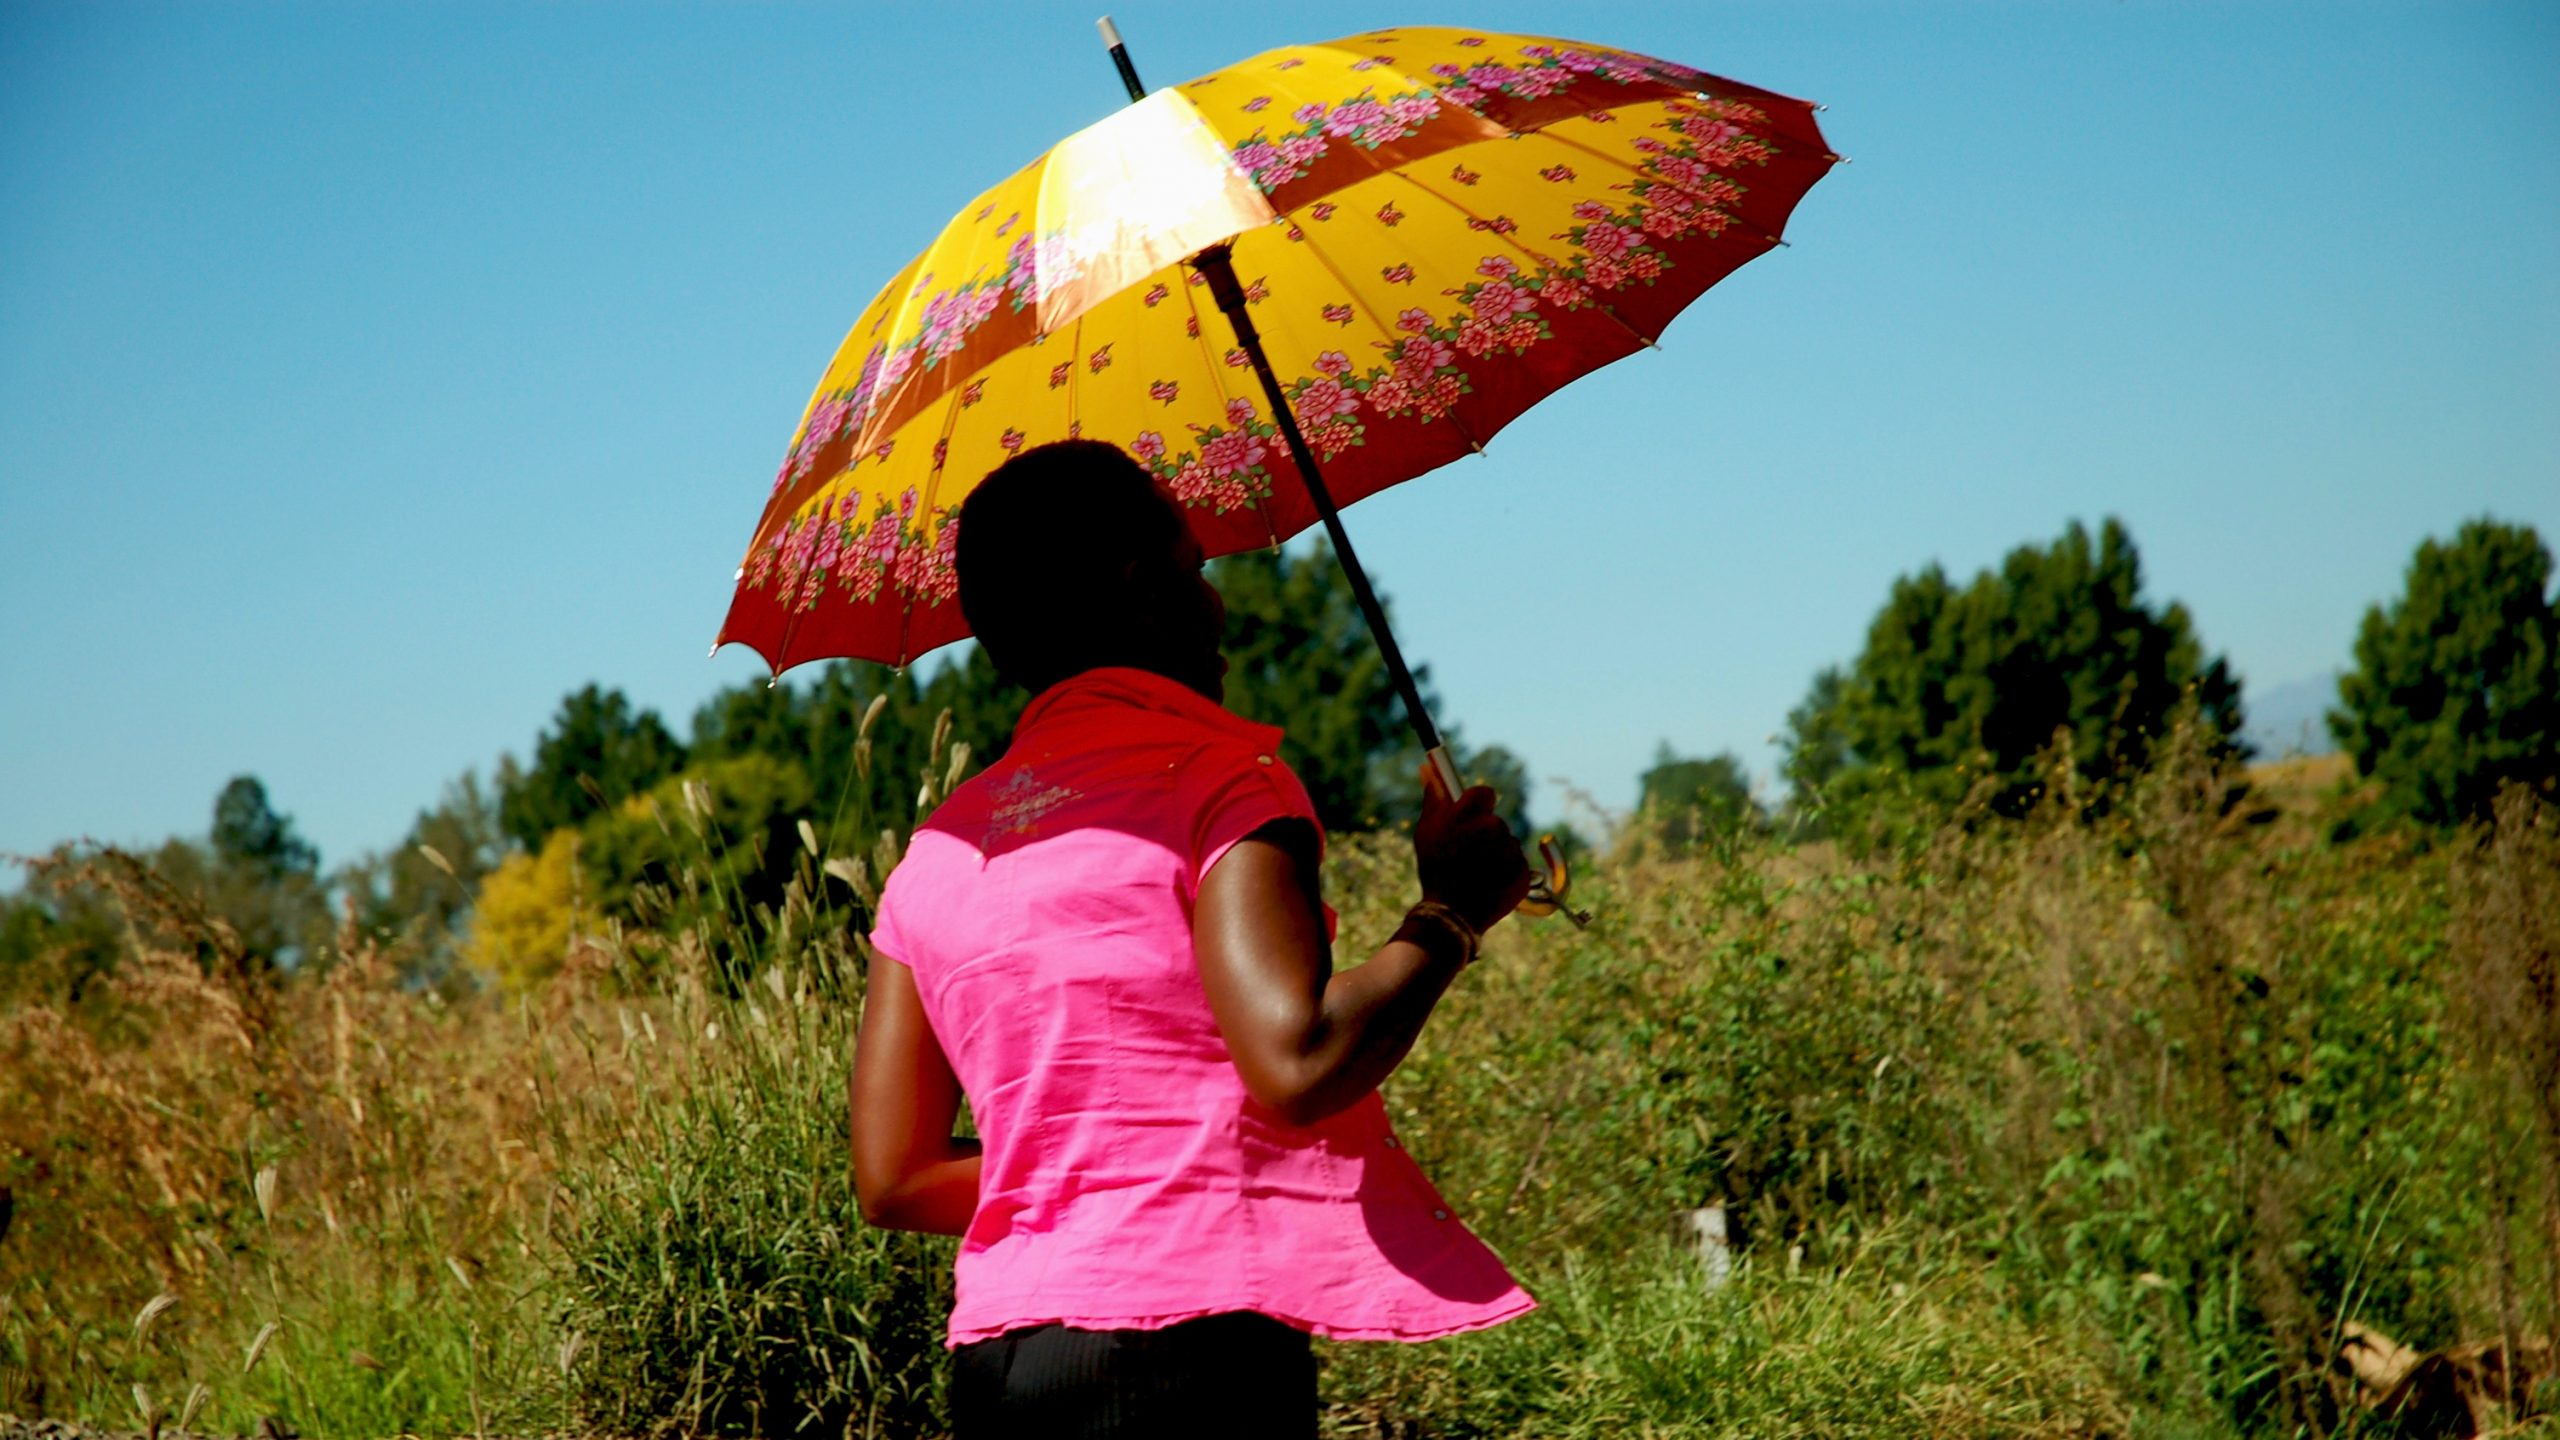 Forced marriage in KwaZulu-Natal